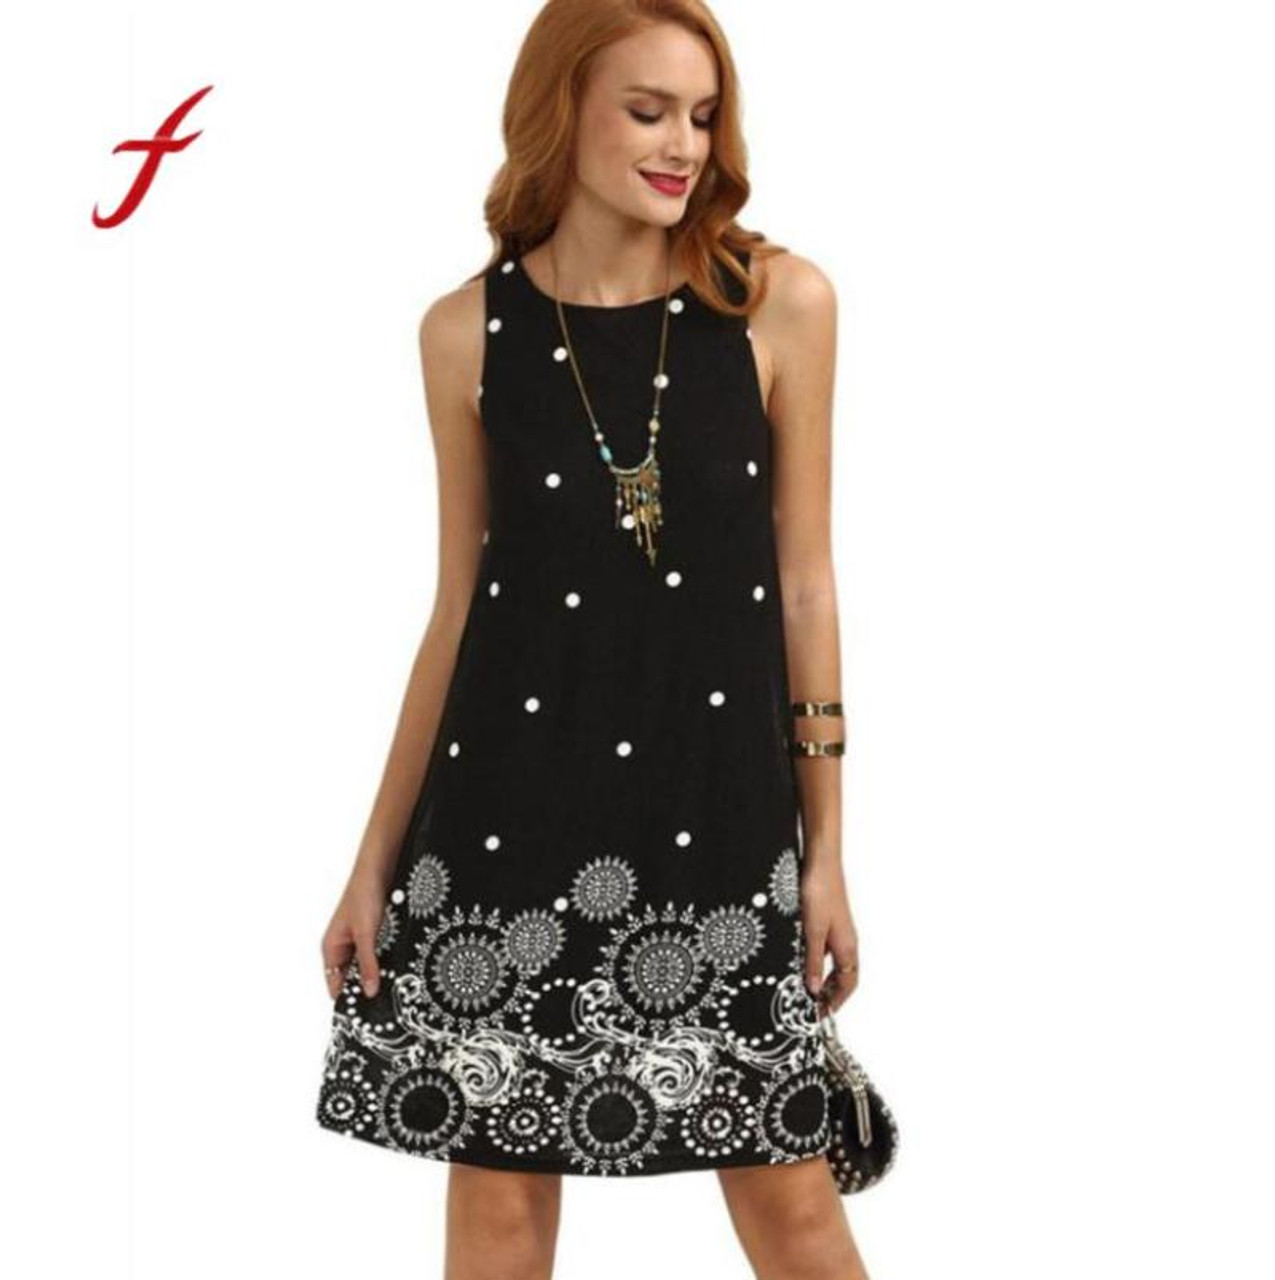 7fd5de38cc Feitong Summer polka dot floral mini chiffon dress Women sexy off shoulder  maix dresses Ladies bohemian black short dress